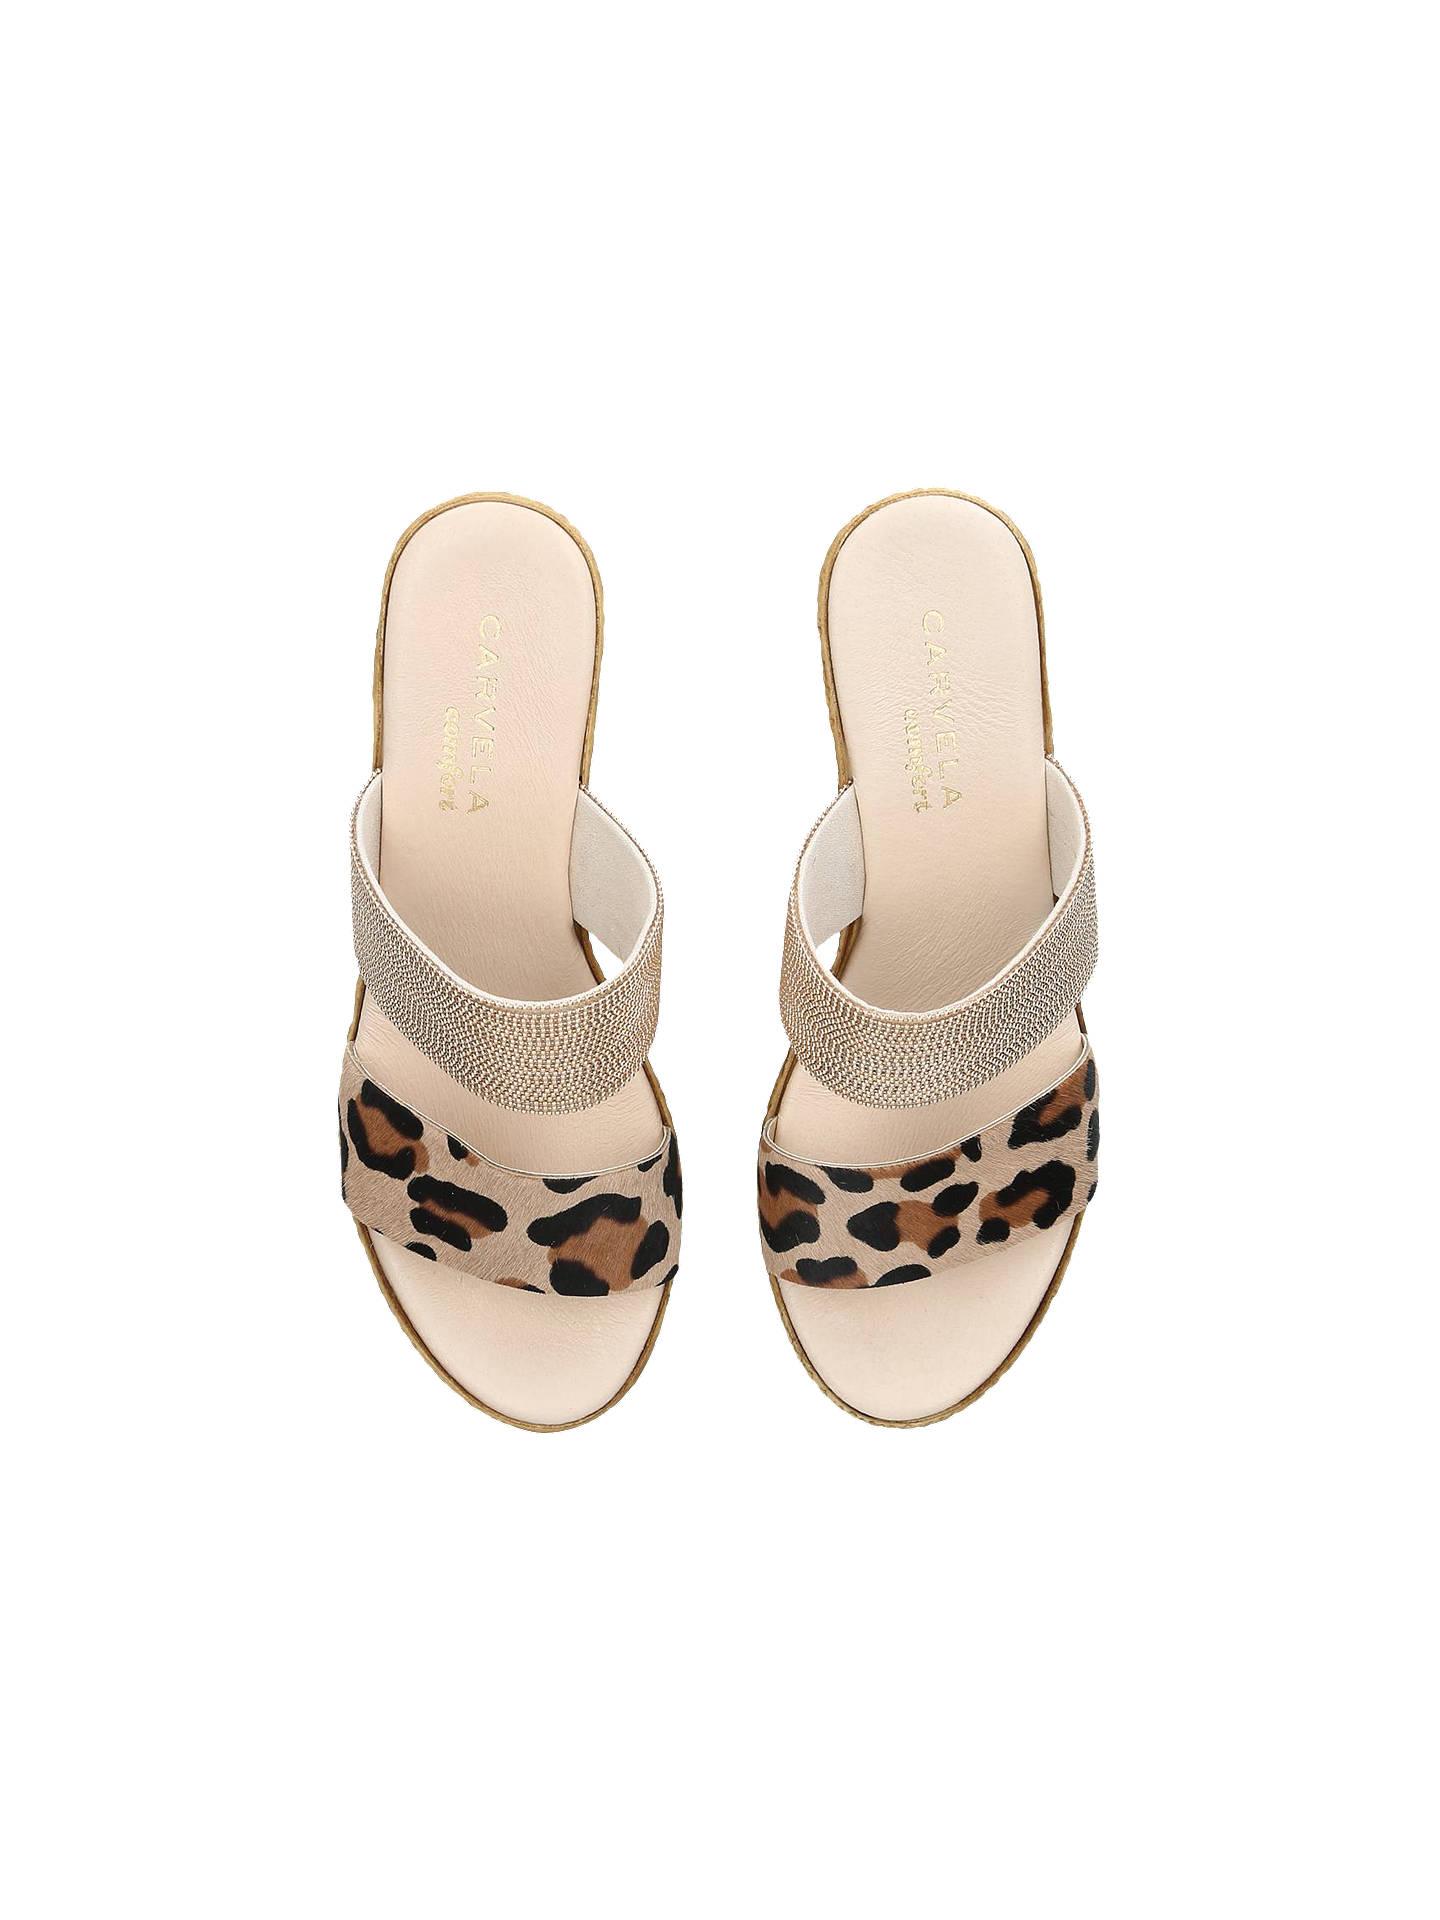 2675f3e1e174 Buy Carvela Comfort Sybil Platform Sandals